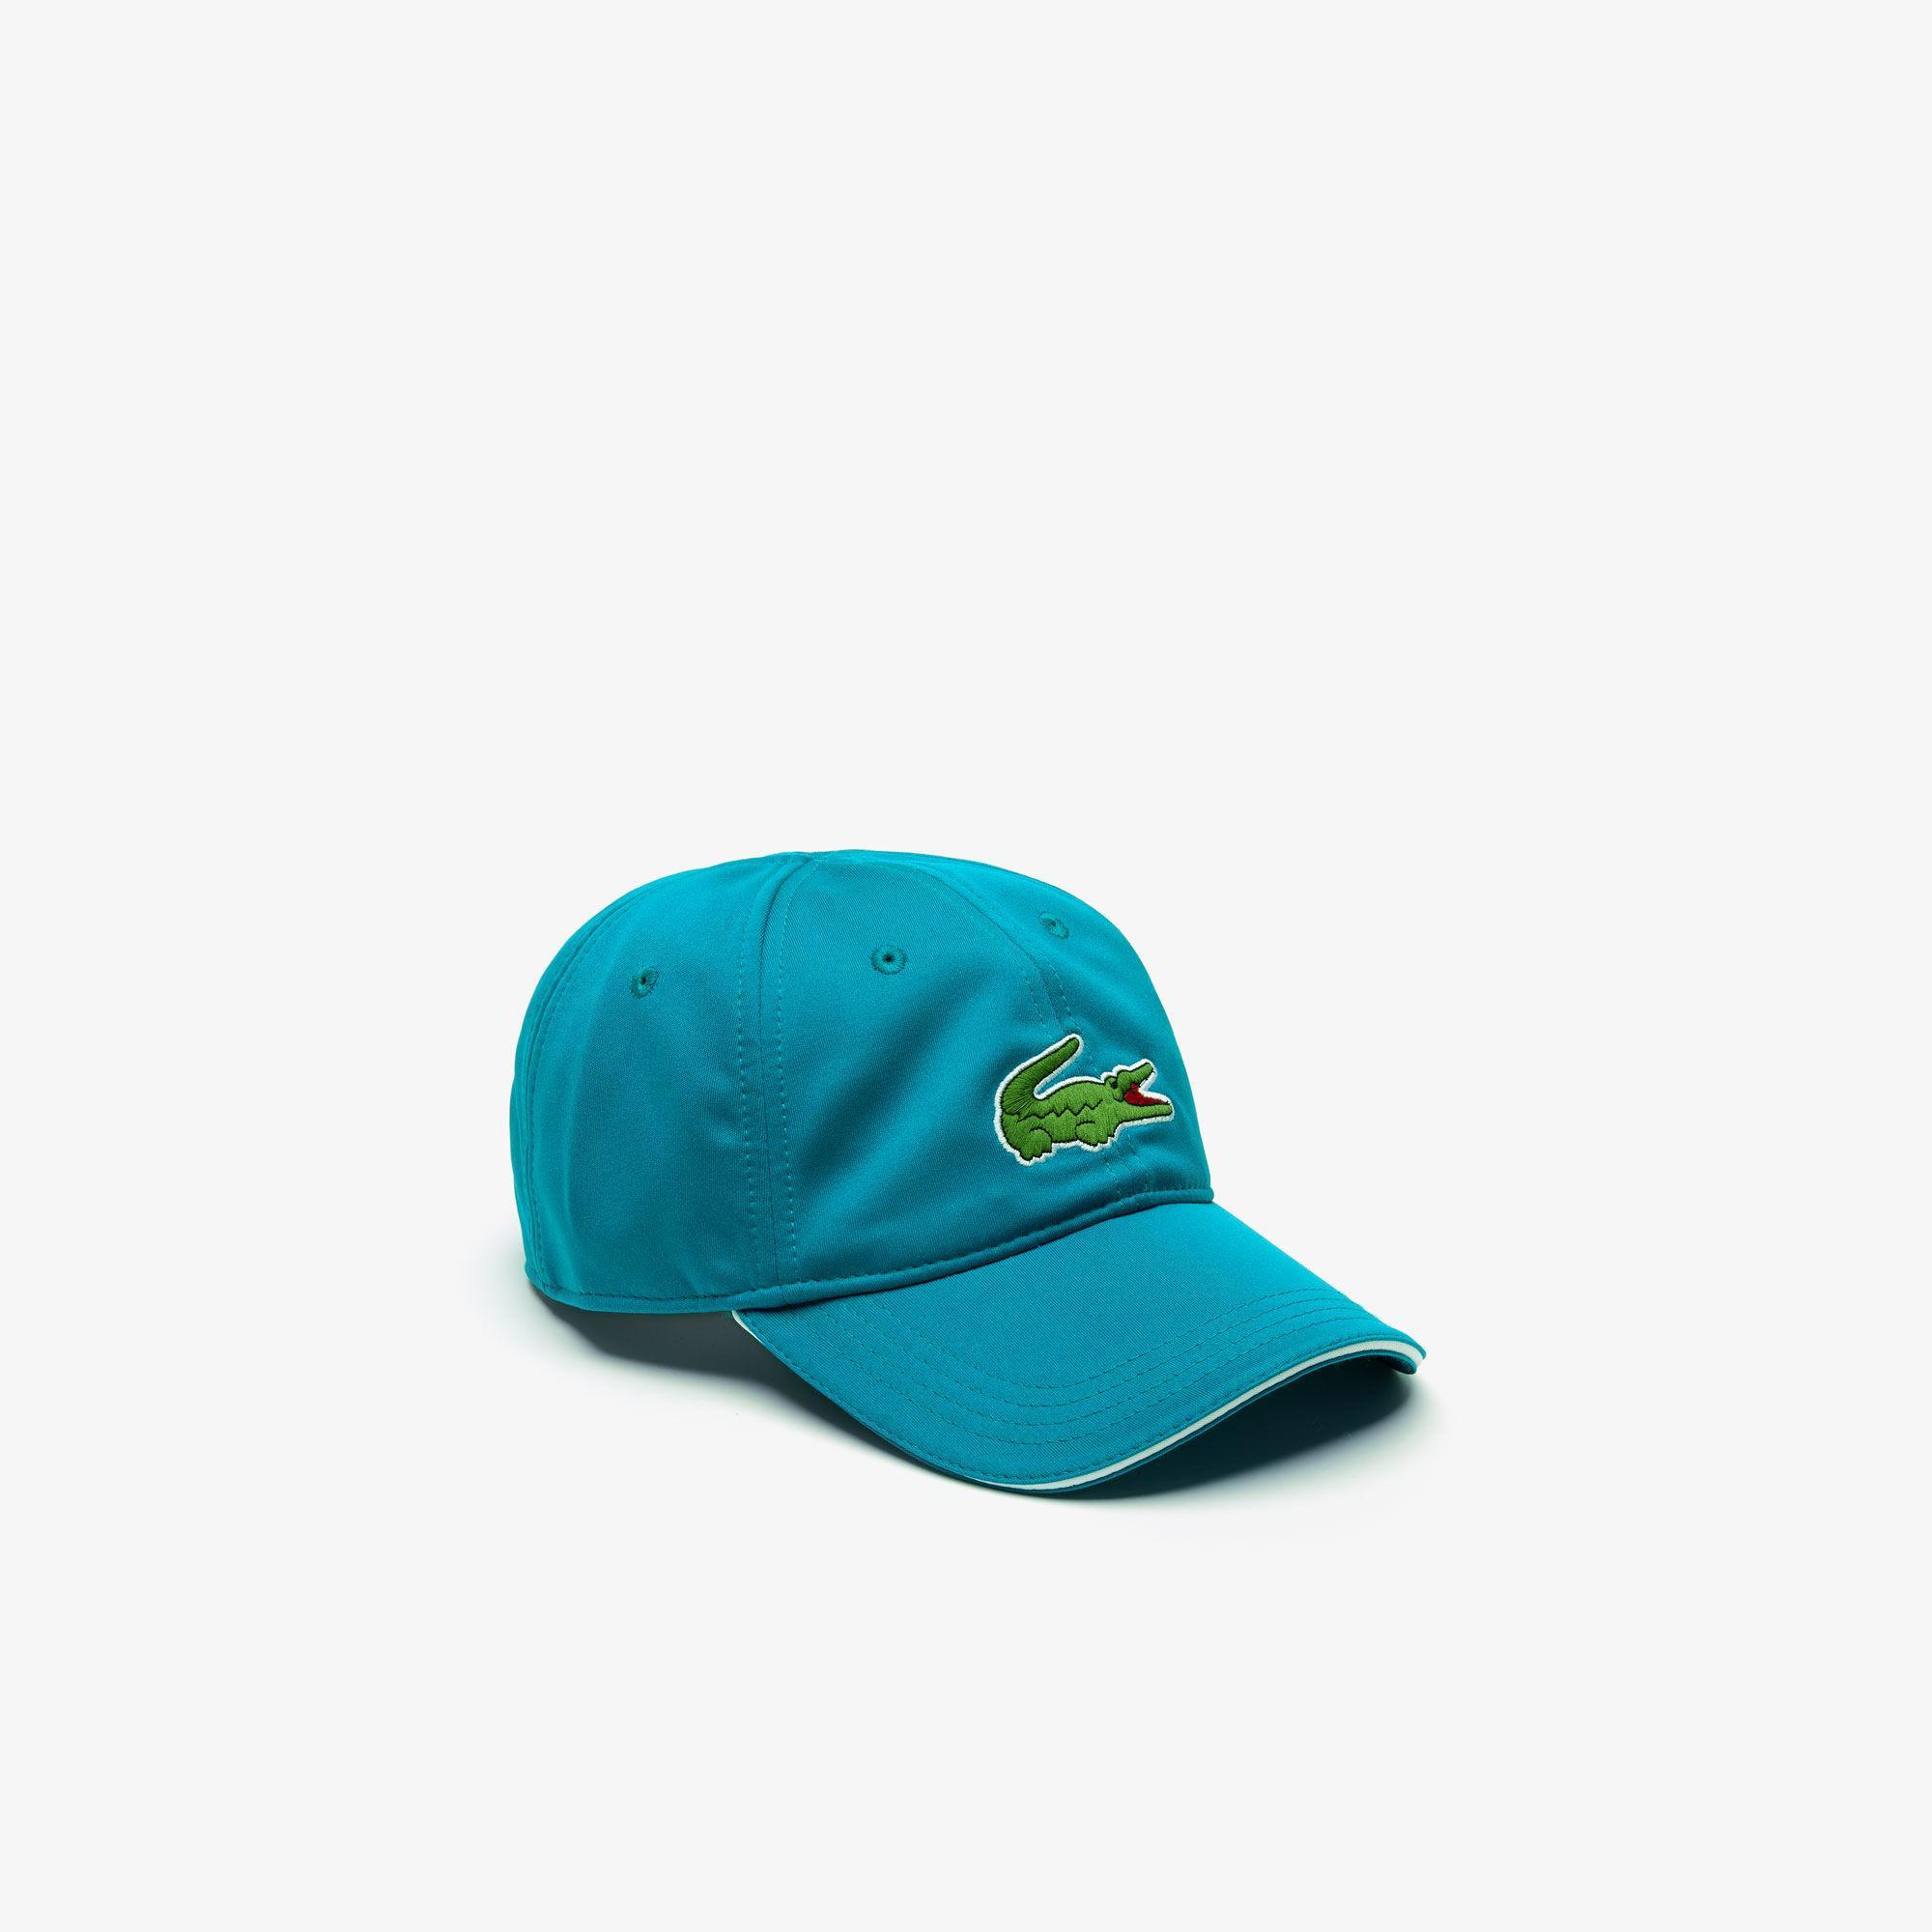 c4679a08981 Lyst - Lacoste Sport Miami Open Edition Cap in Blue for Men